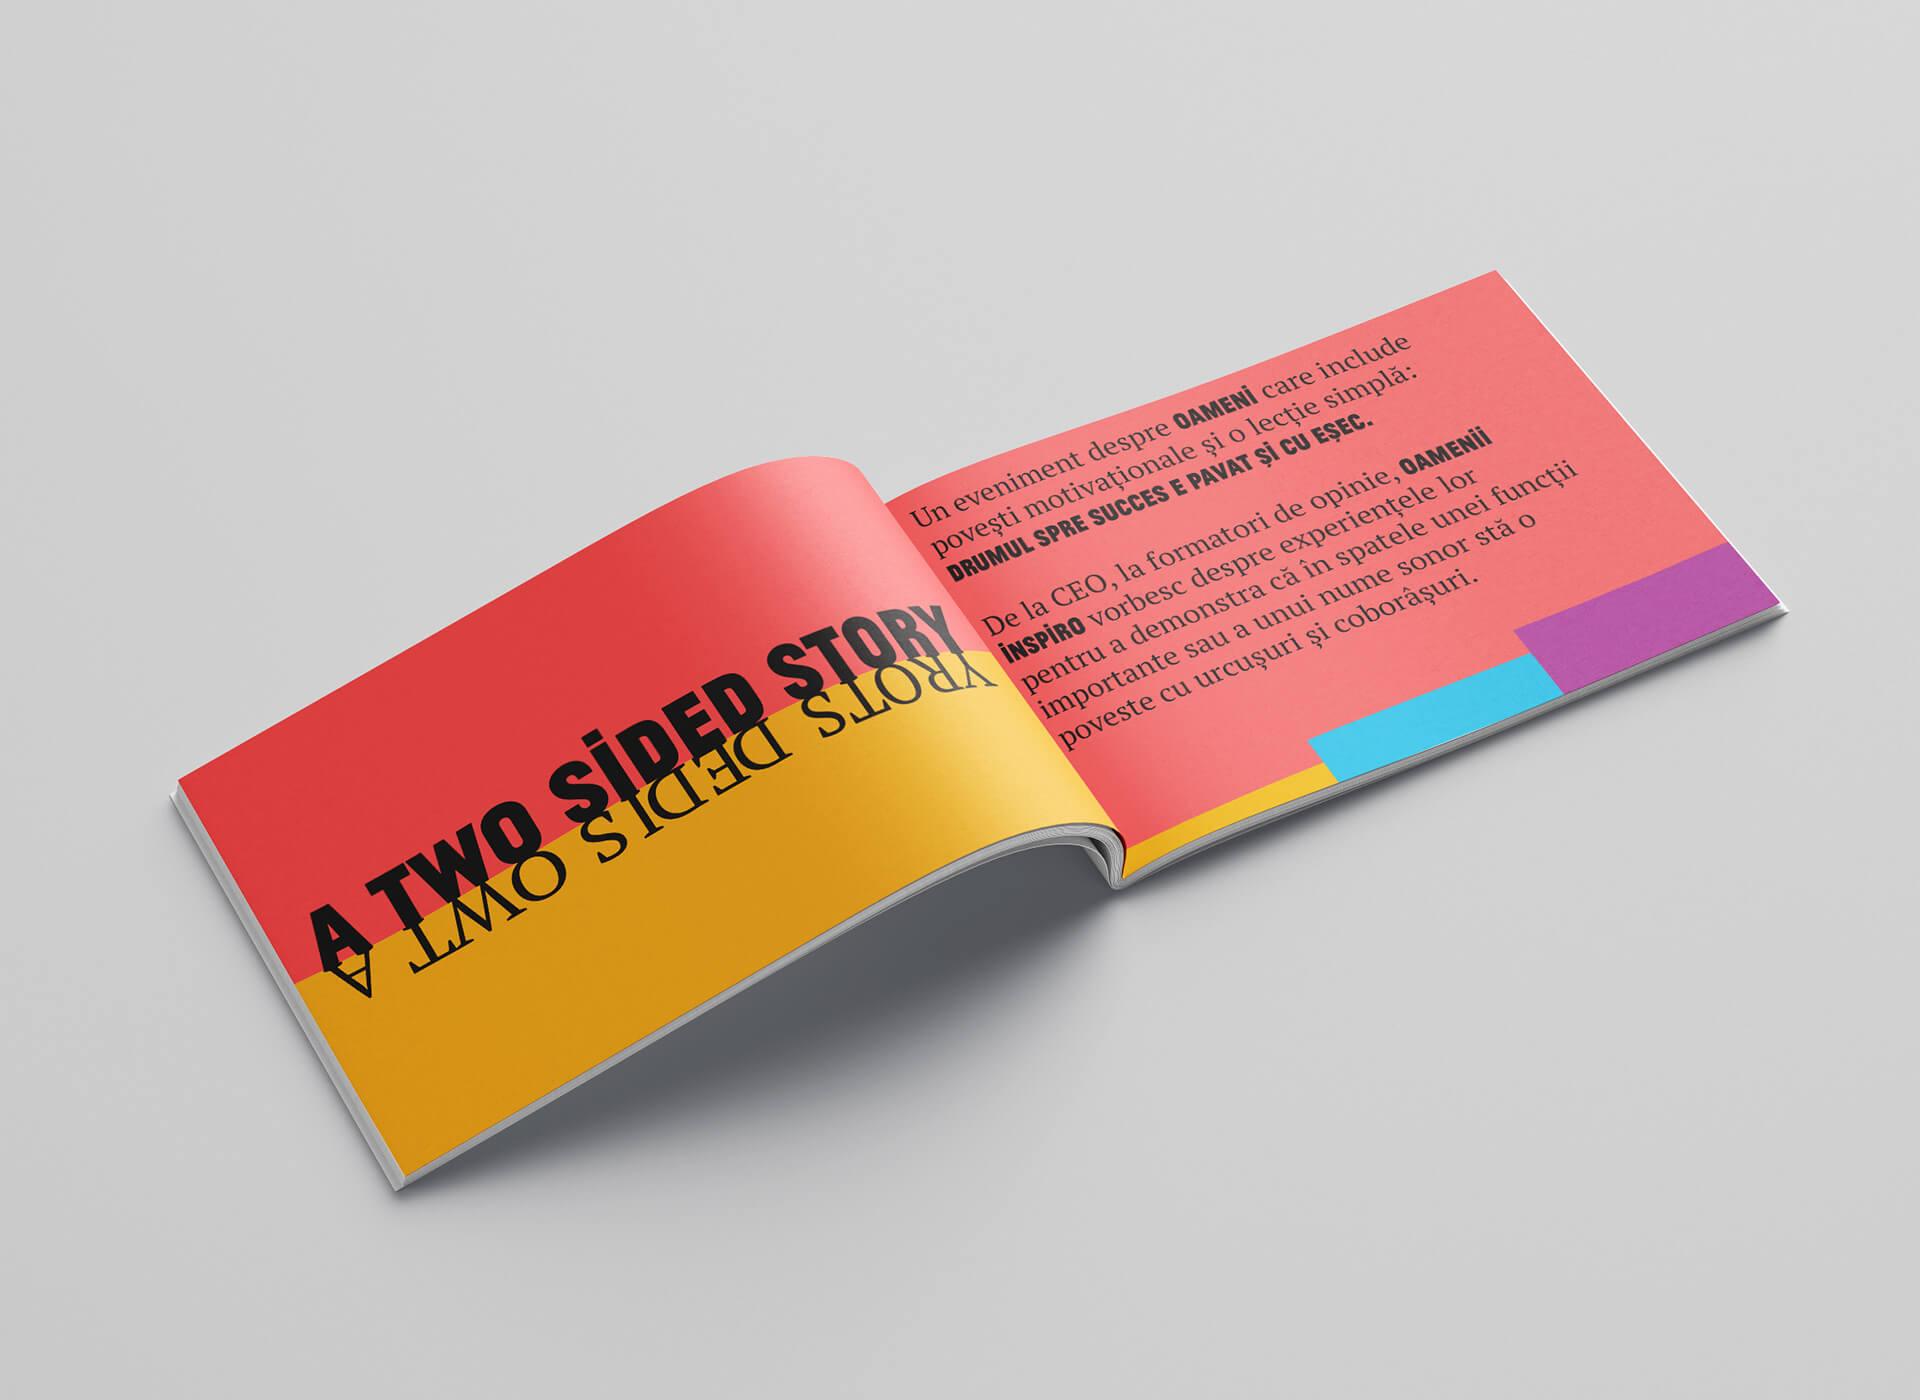 Inspiro portofoliu inoveo brochure